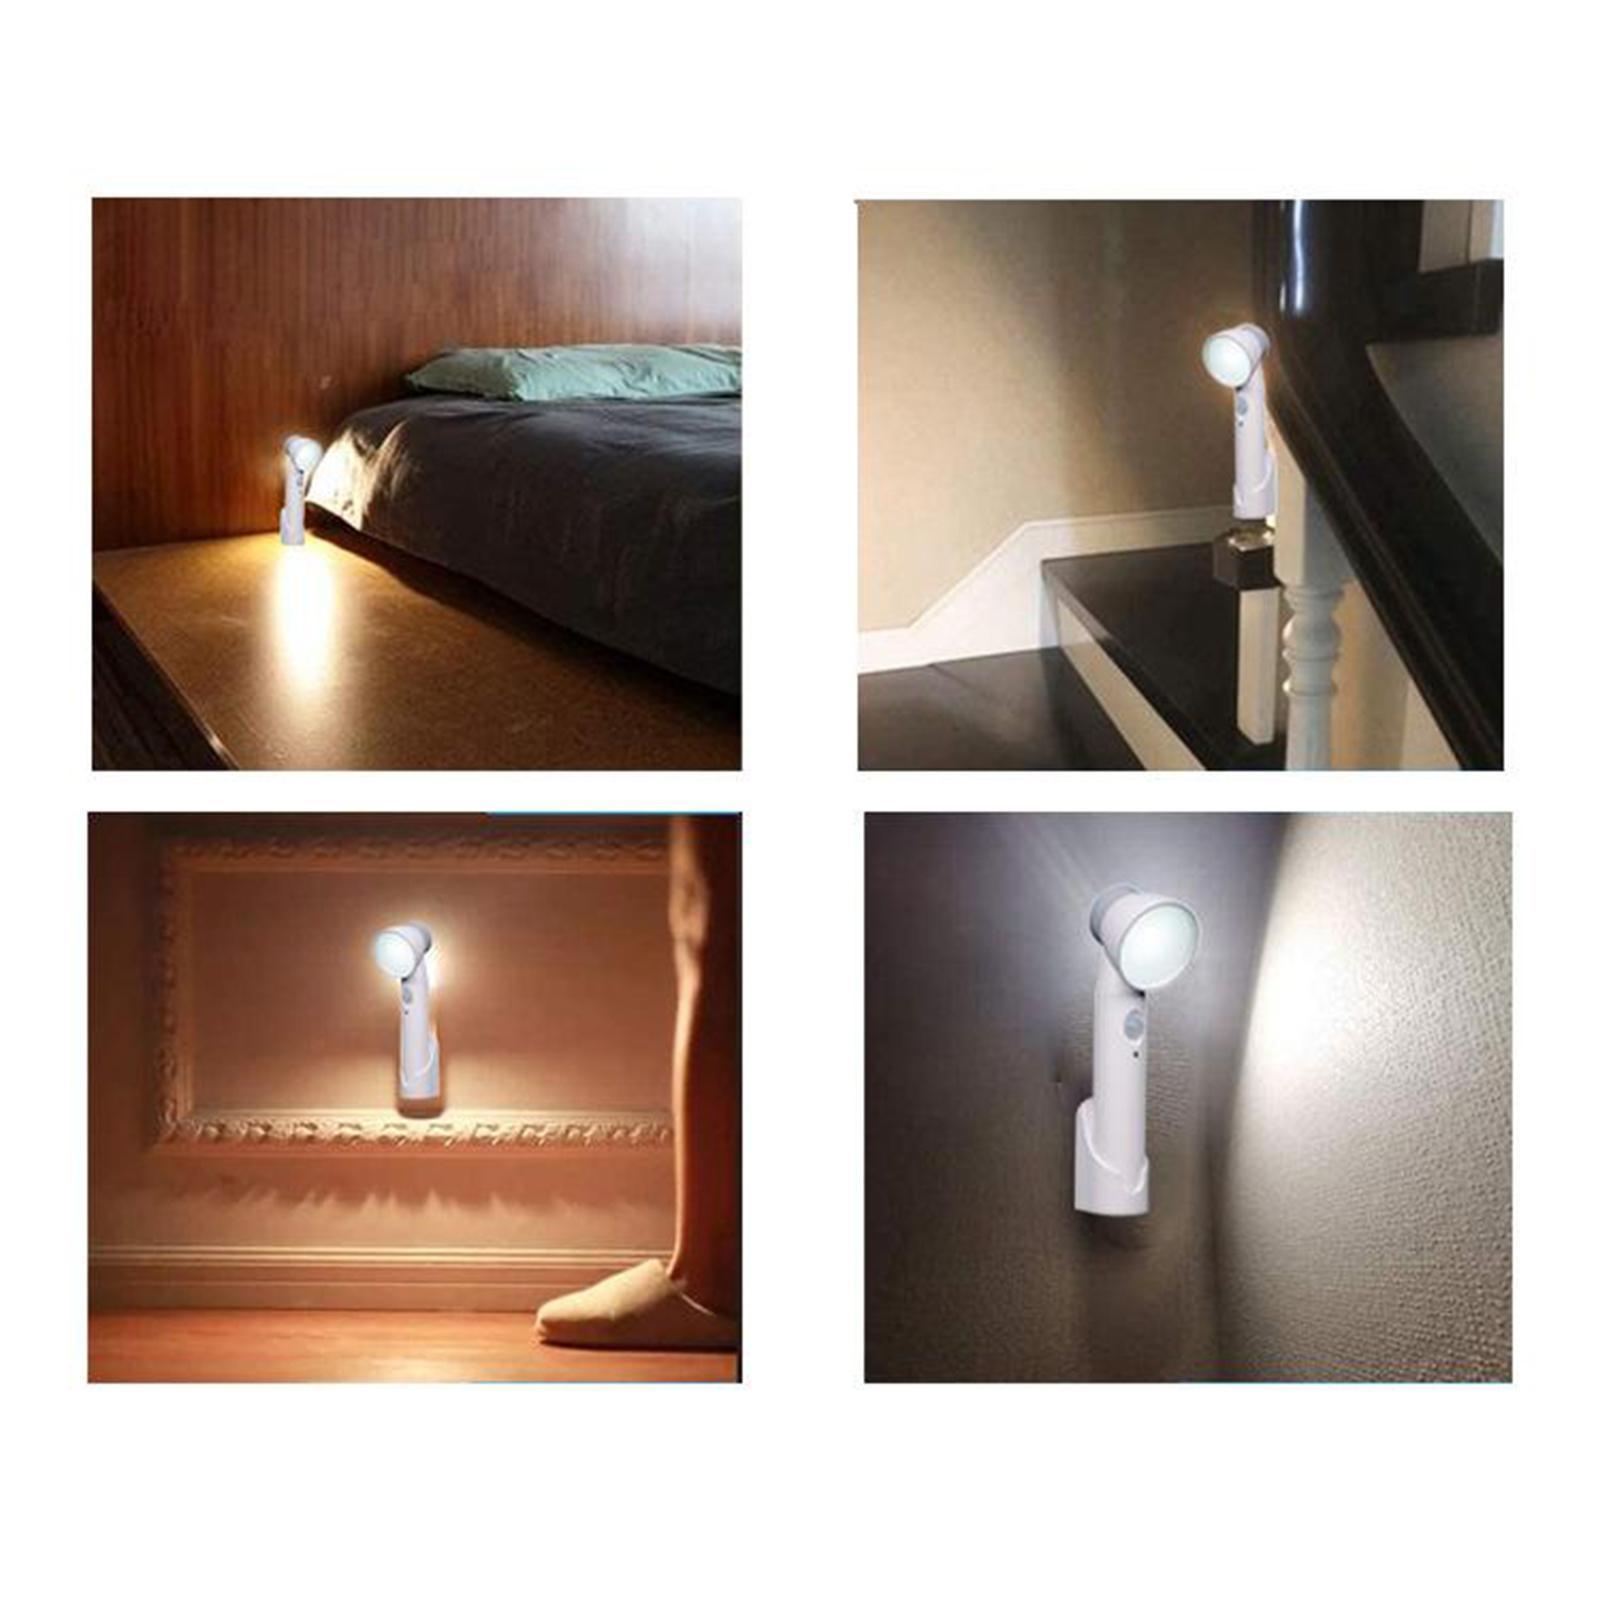 miniatura 7 - Luce-notturna-4W-Casa-Camera-da-letto-Corridoio-Lampada-di-sicurezza-Sensore-di